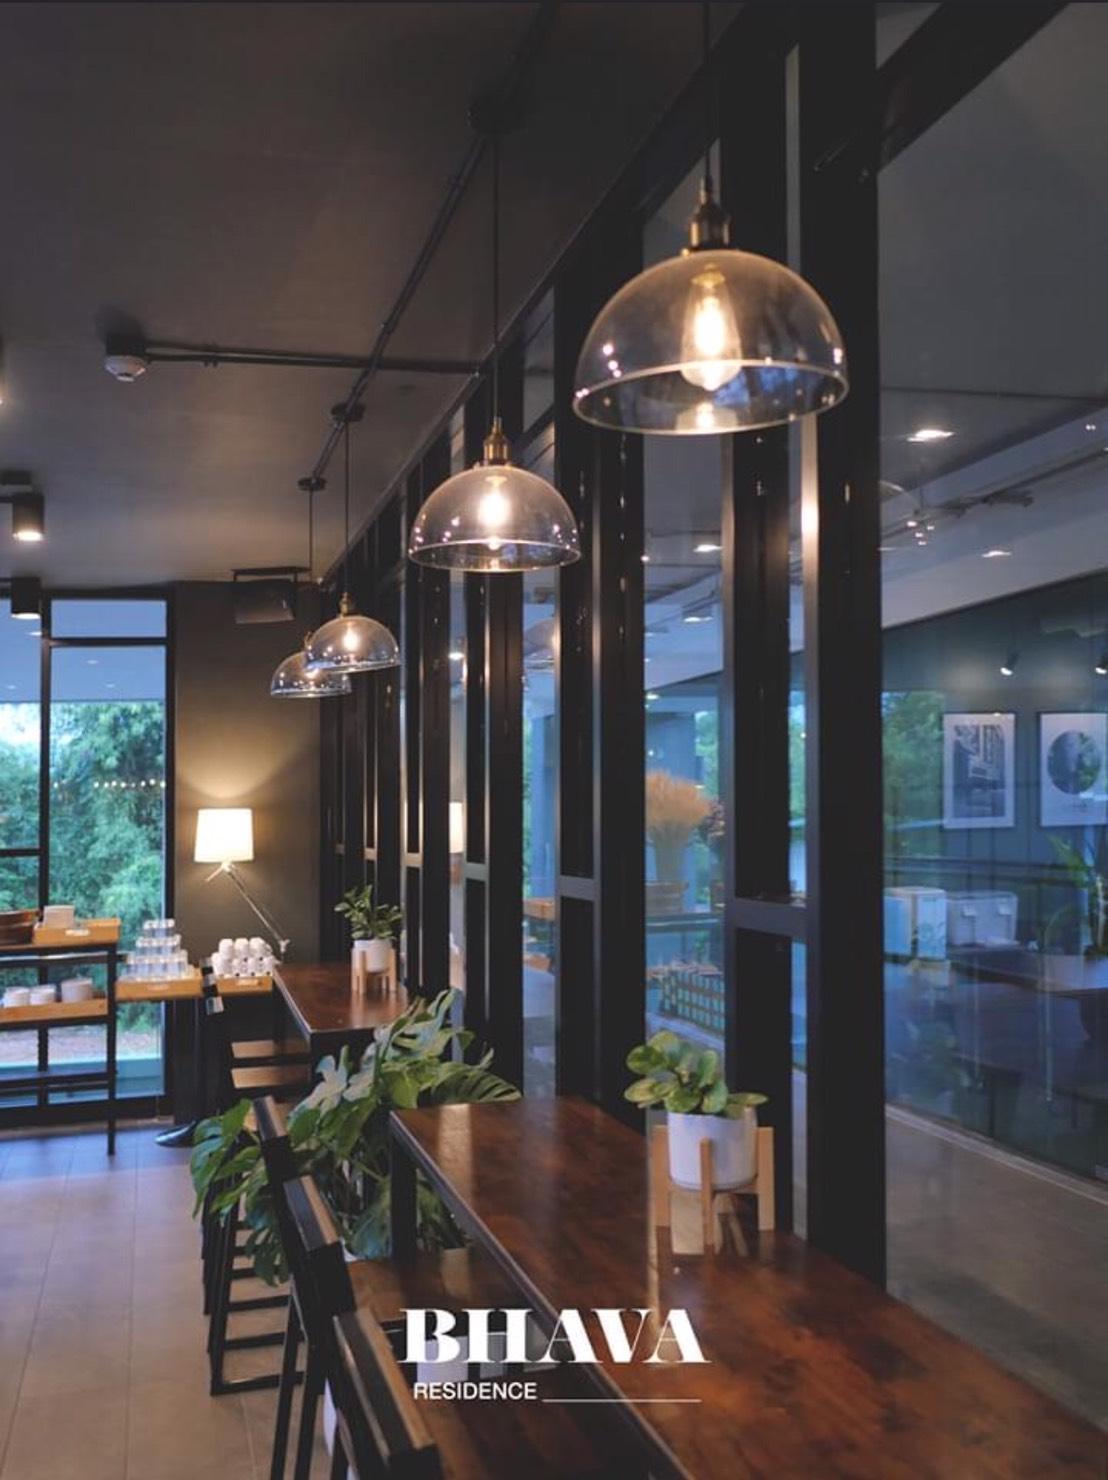 Bhava Residence, Hat Yai